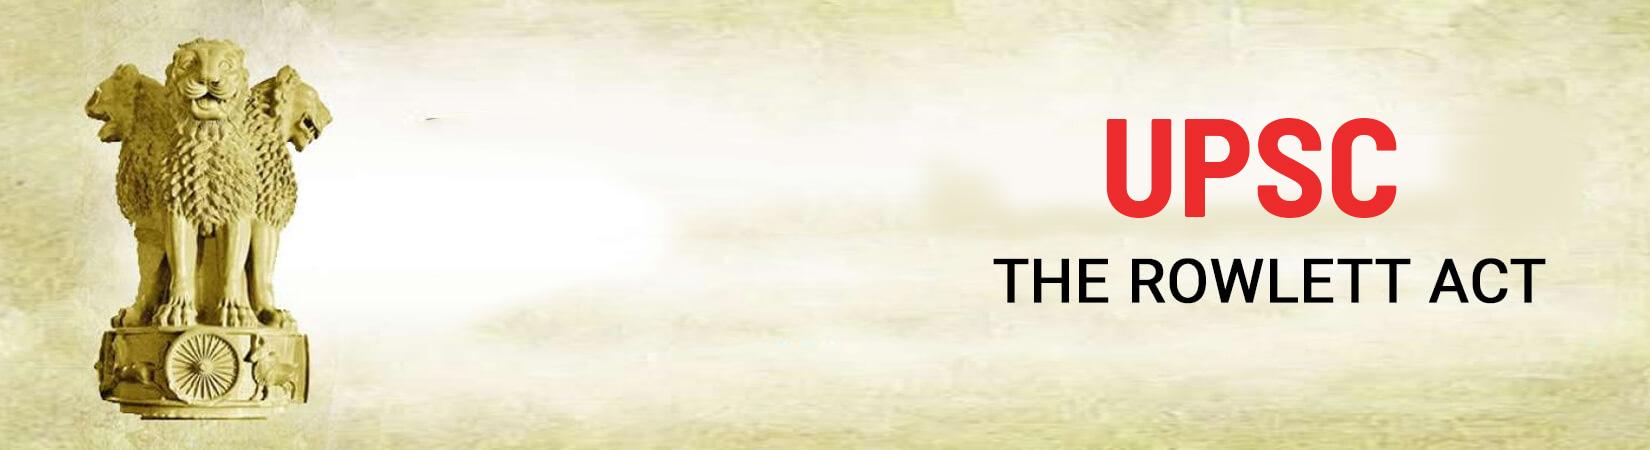 The Rowlatt Act: UPSC  Important Topics